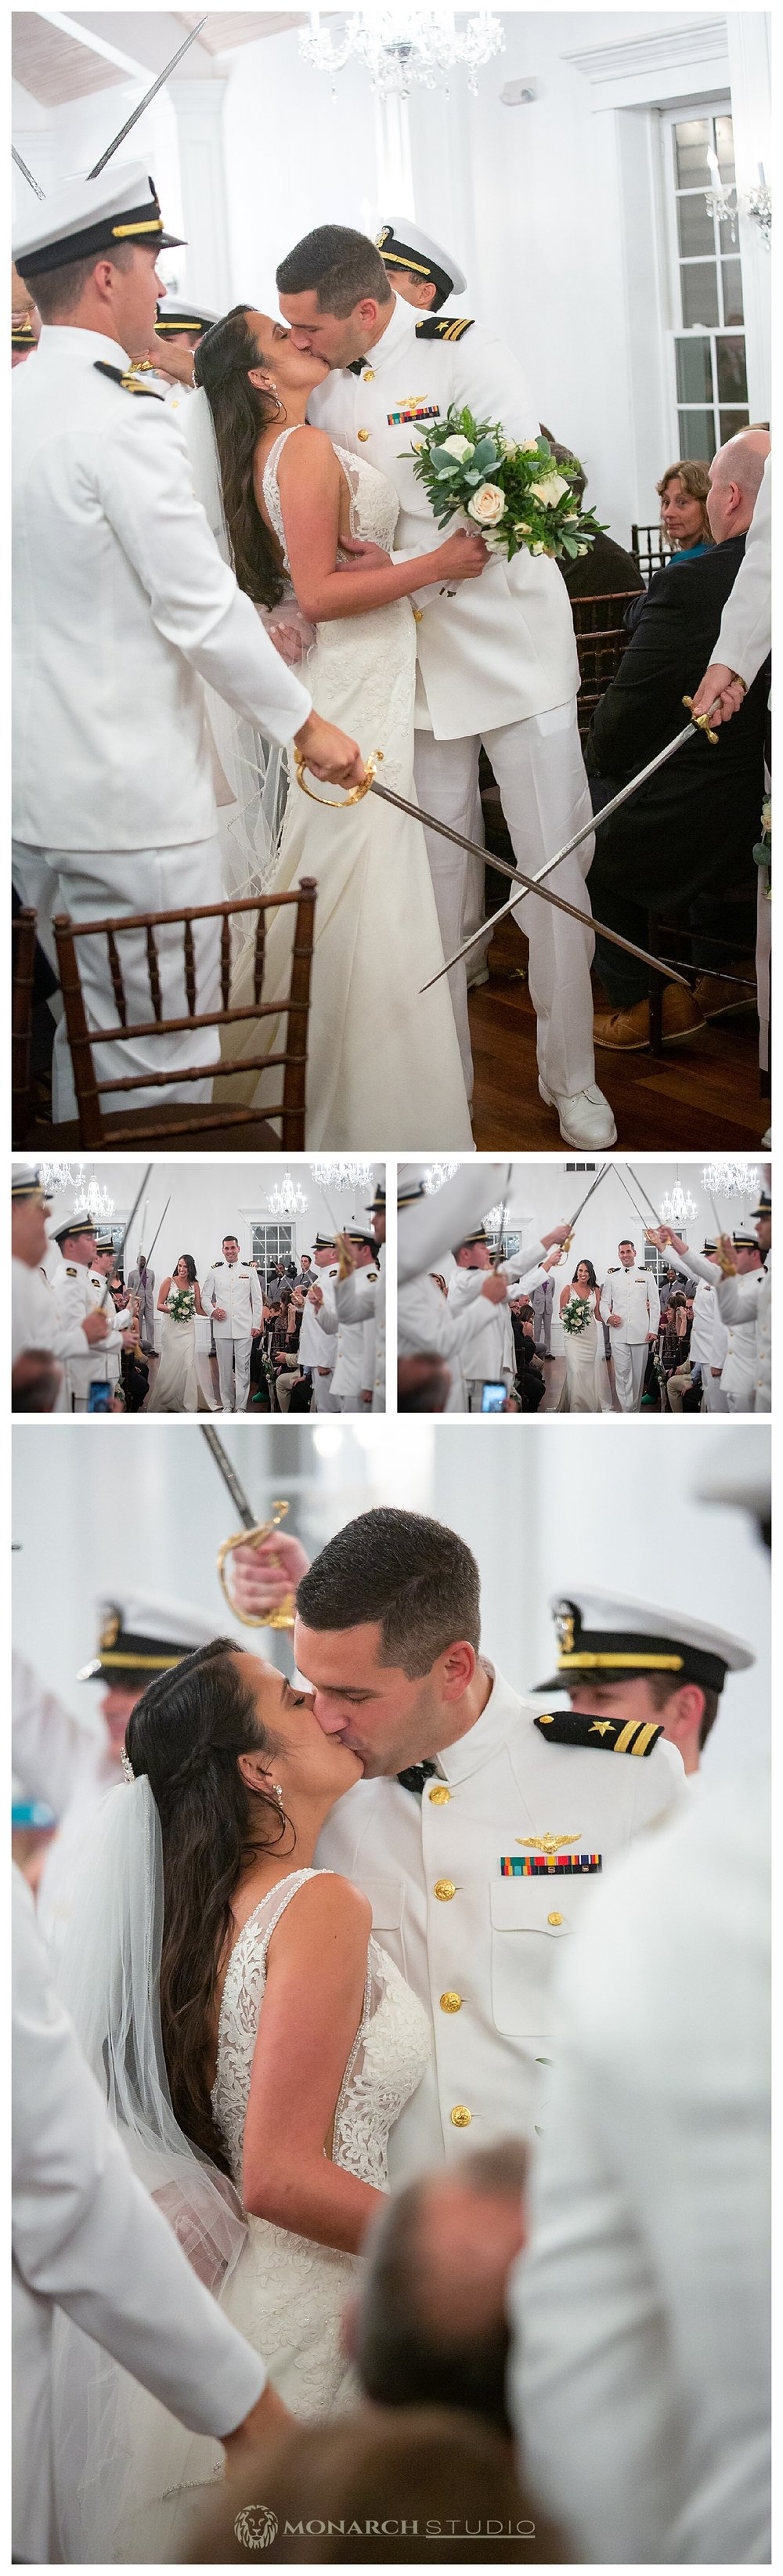 White Room Wedding Photography 025.JPG